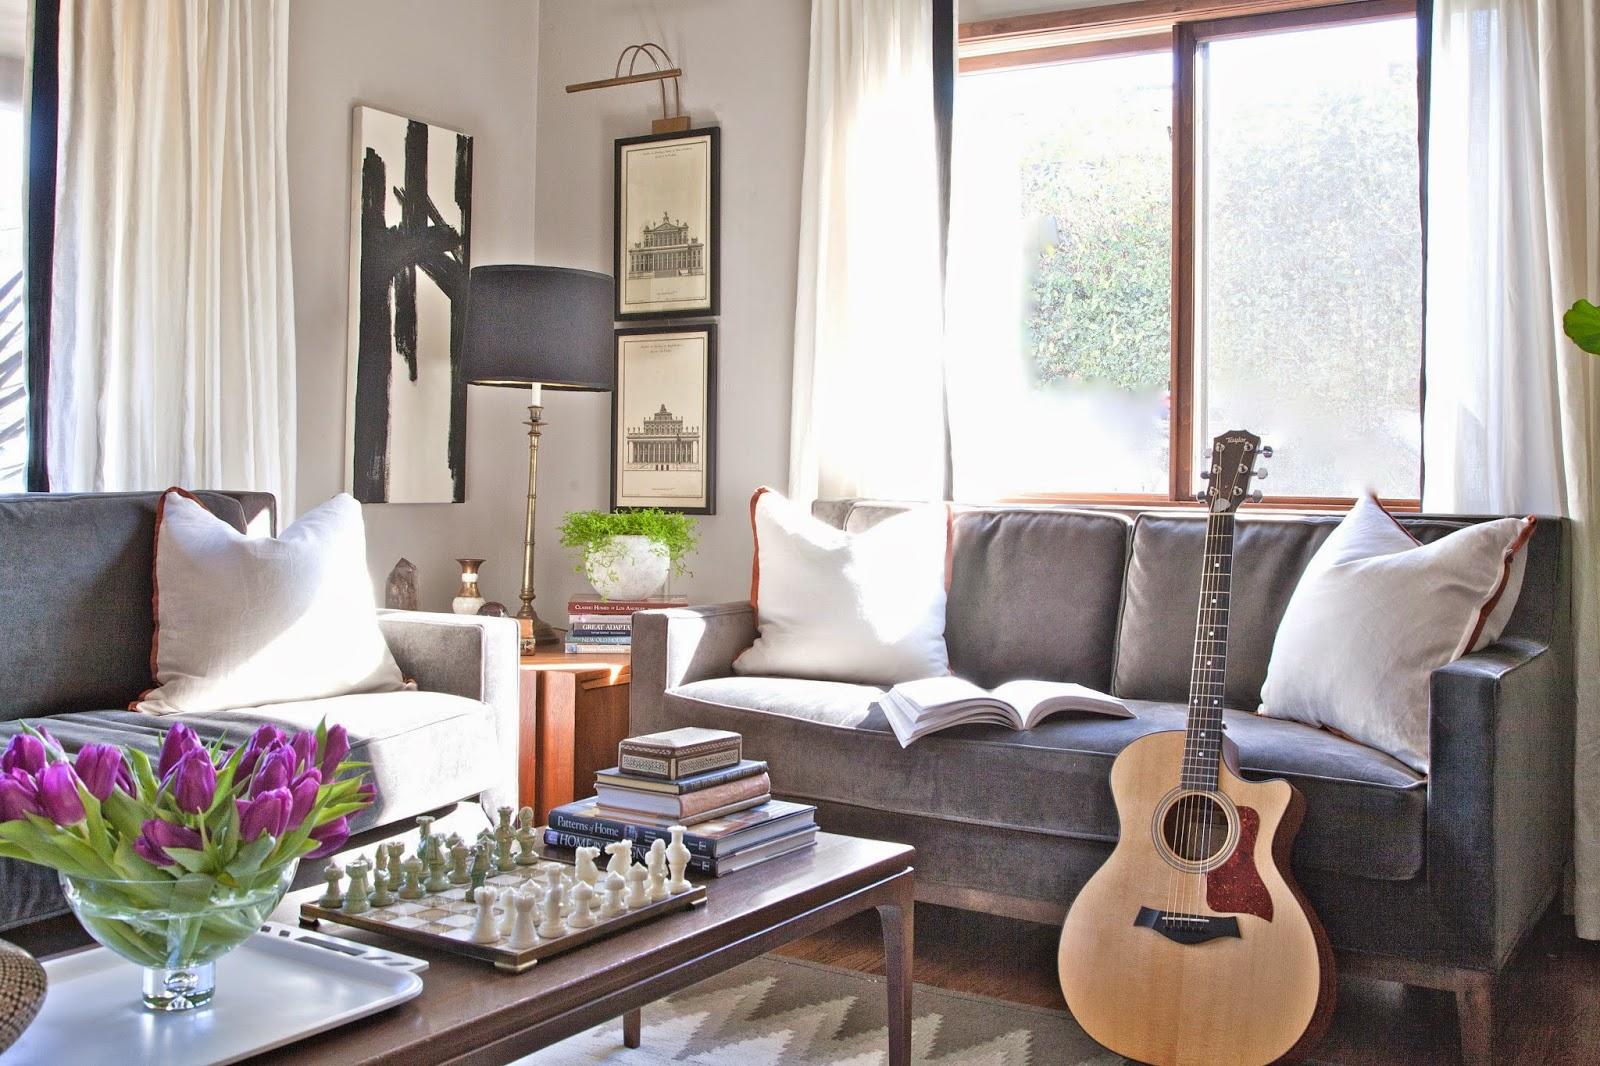 Rosa Beltran Design My Home Tour Part 4 The Living Room